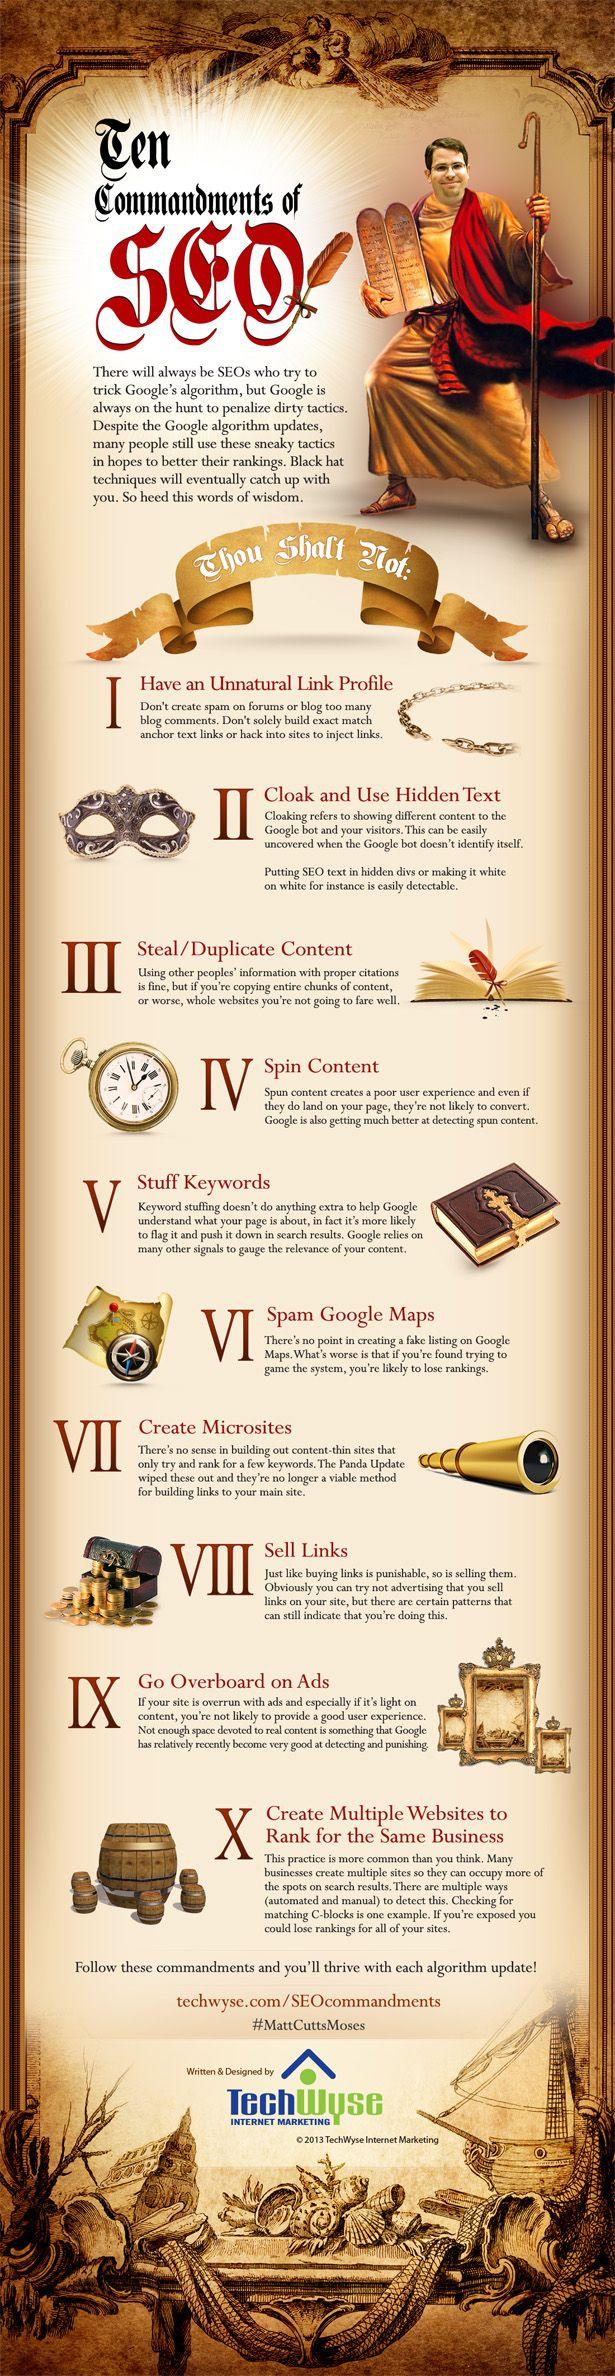 The 10 Commandments of #SEO